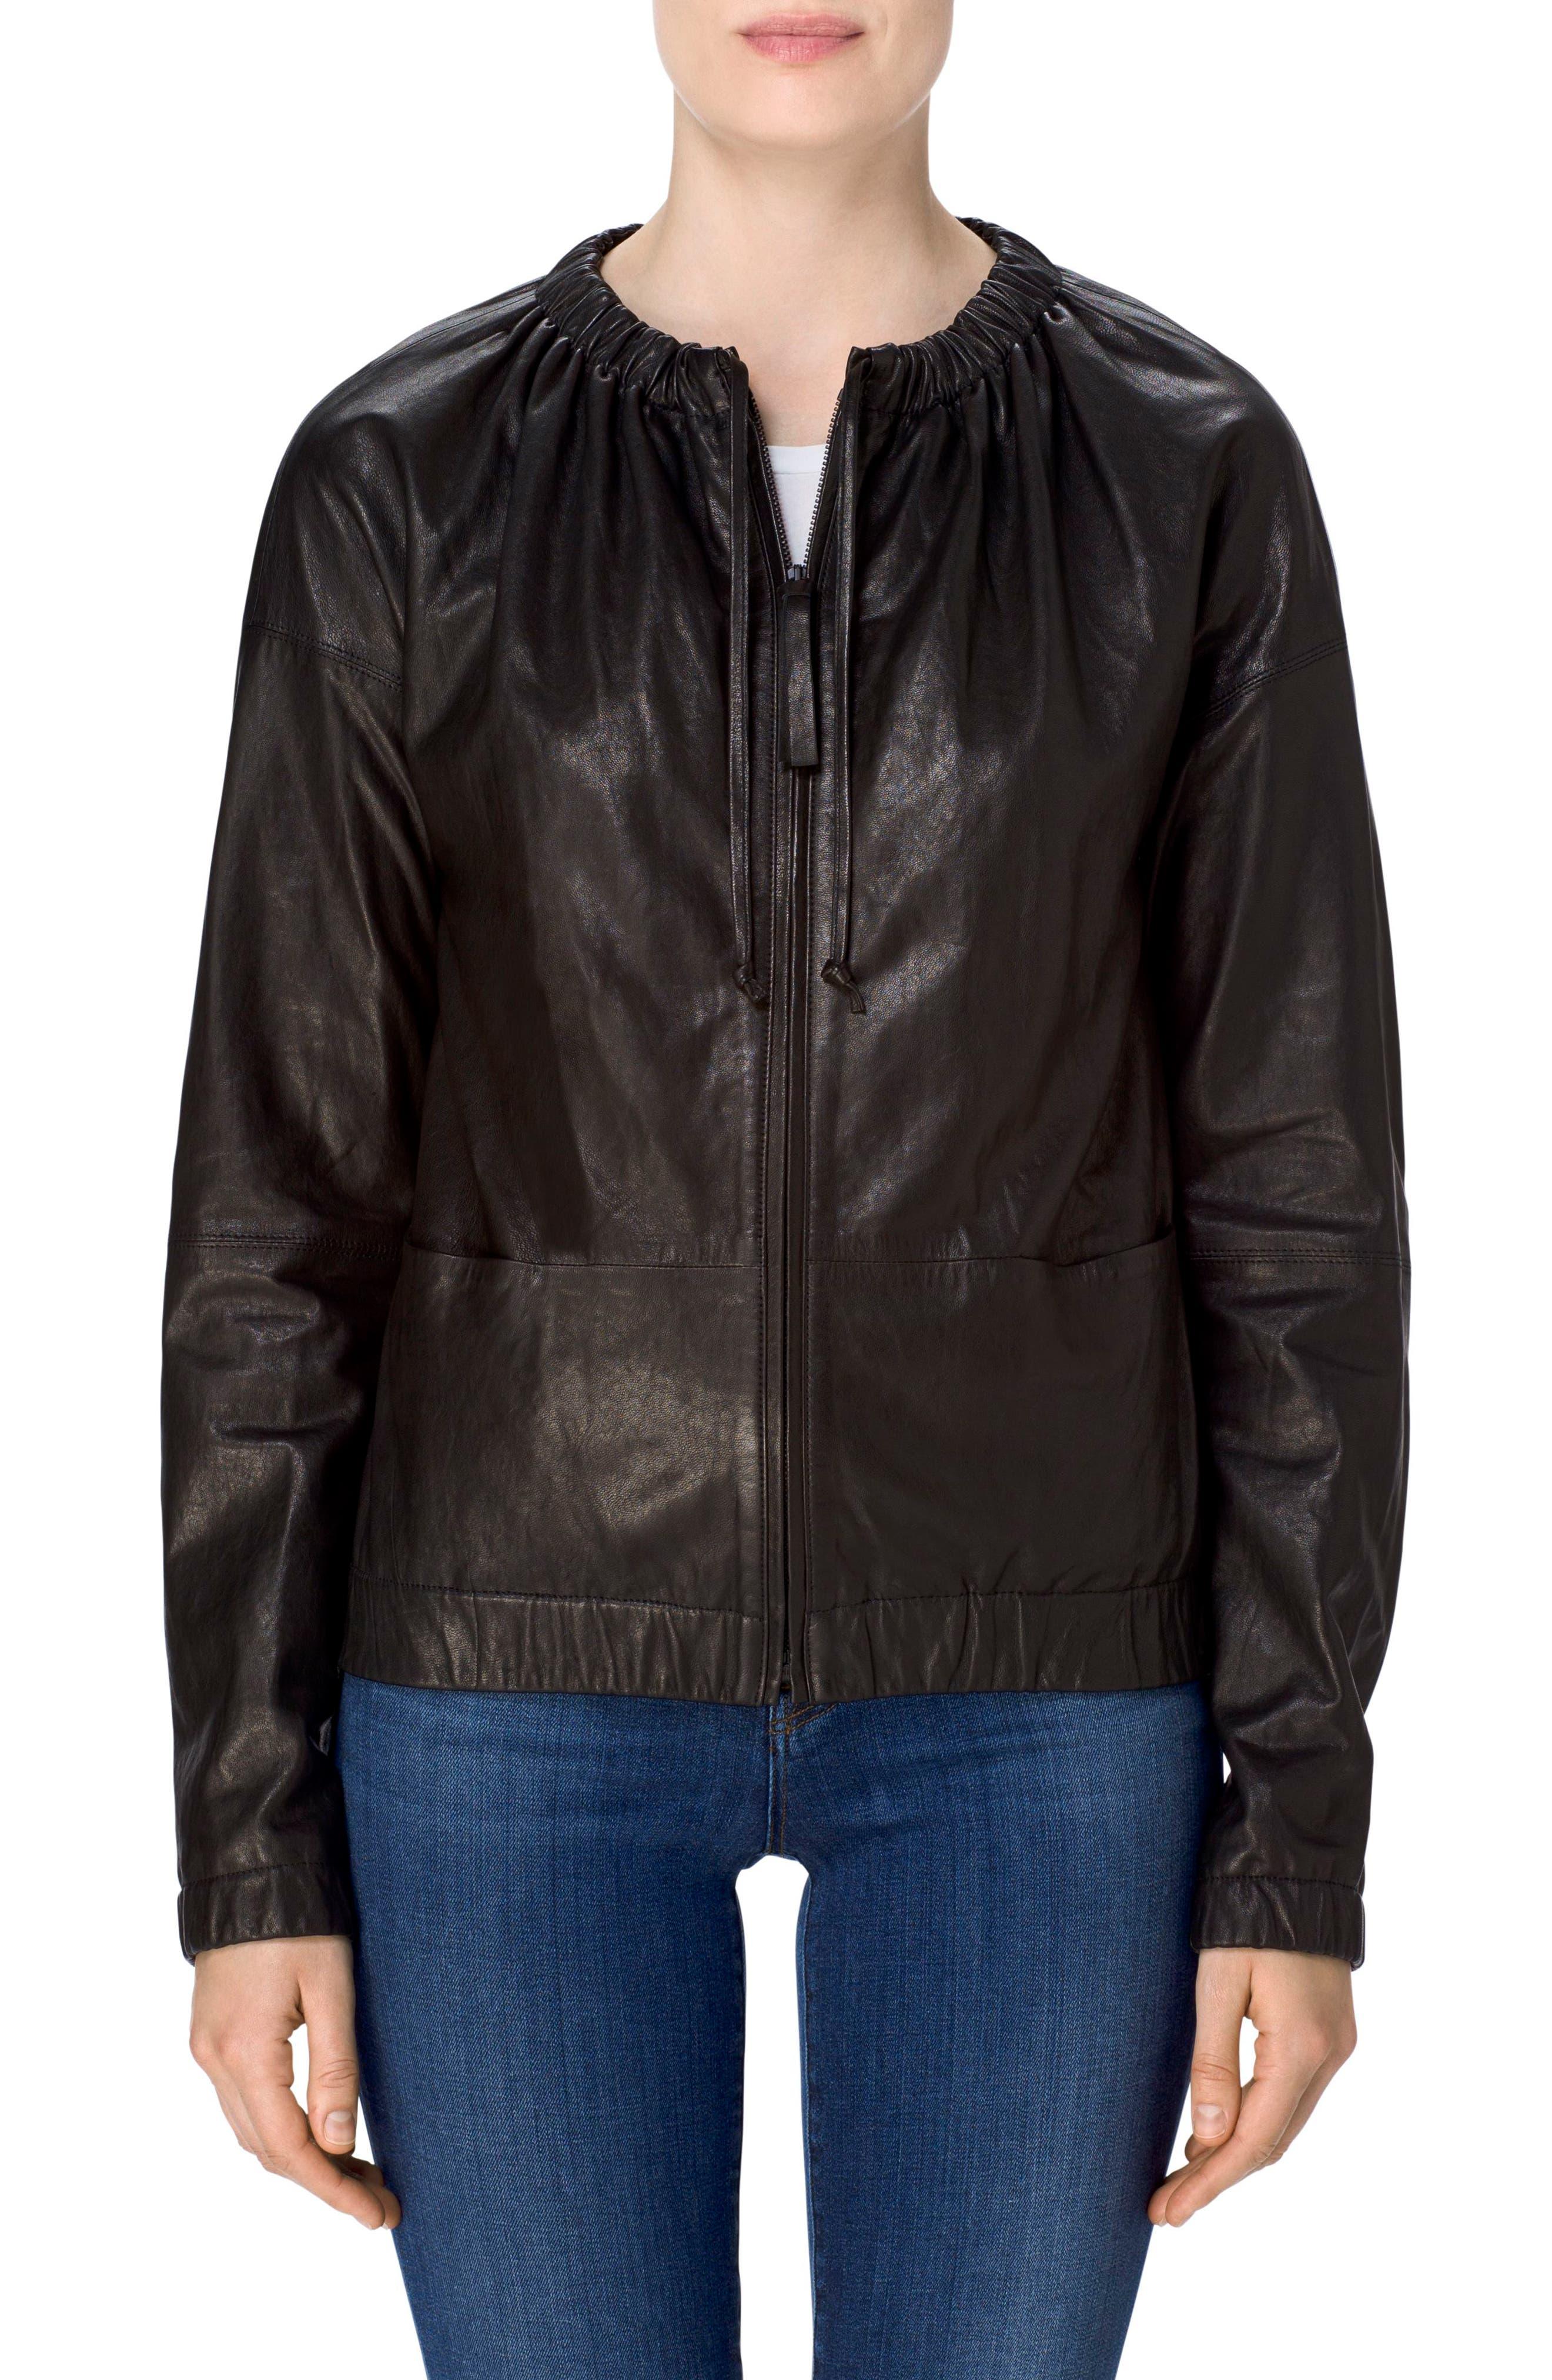 Baez Leather Bomber Jacket,                             Alternate thumbnail 2, color,                             001